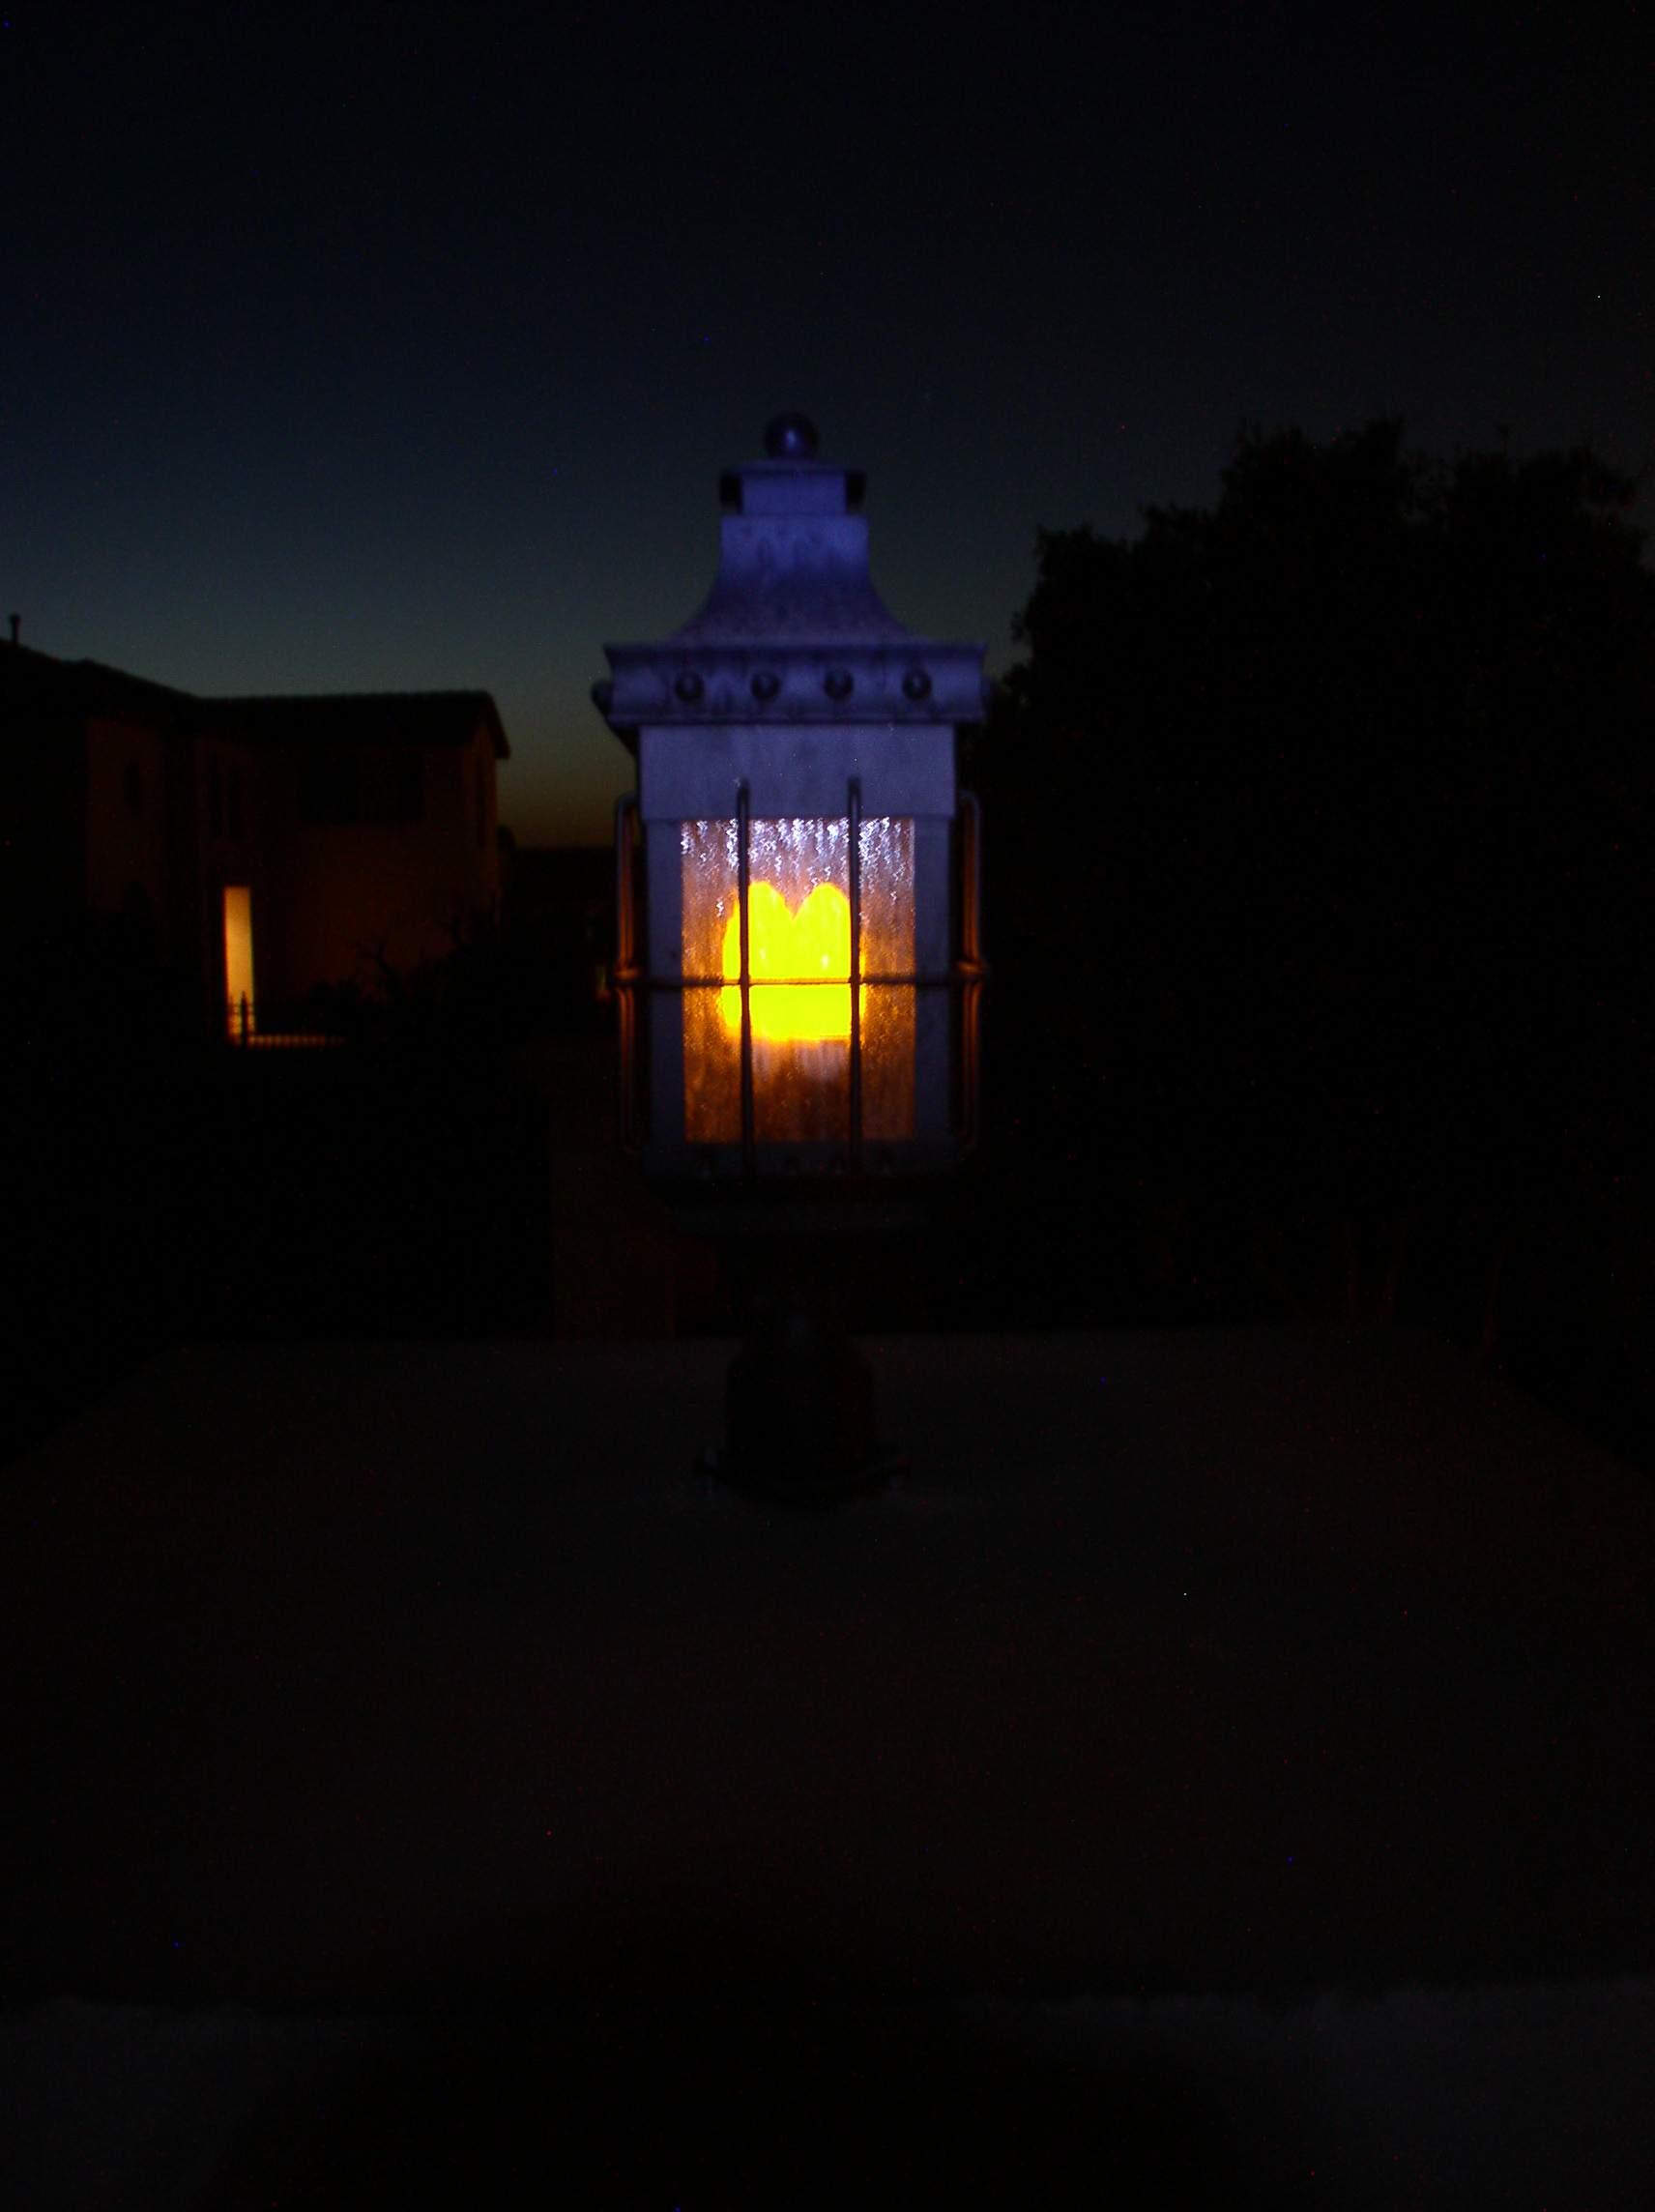 Candelabra gas light